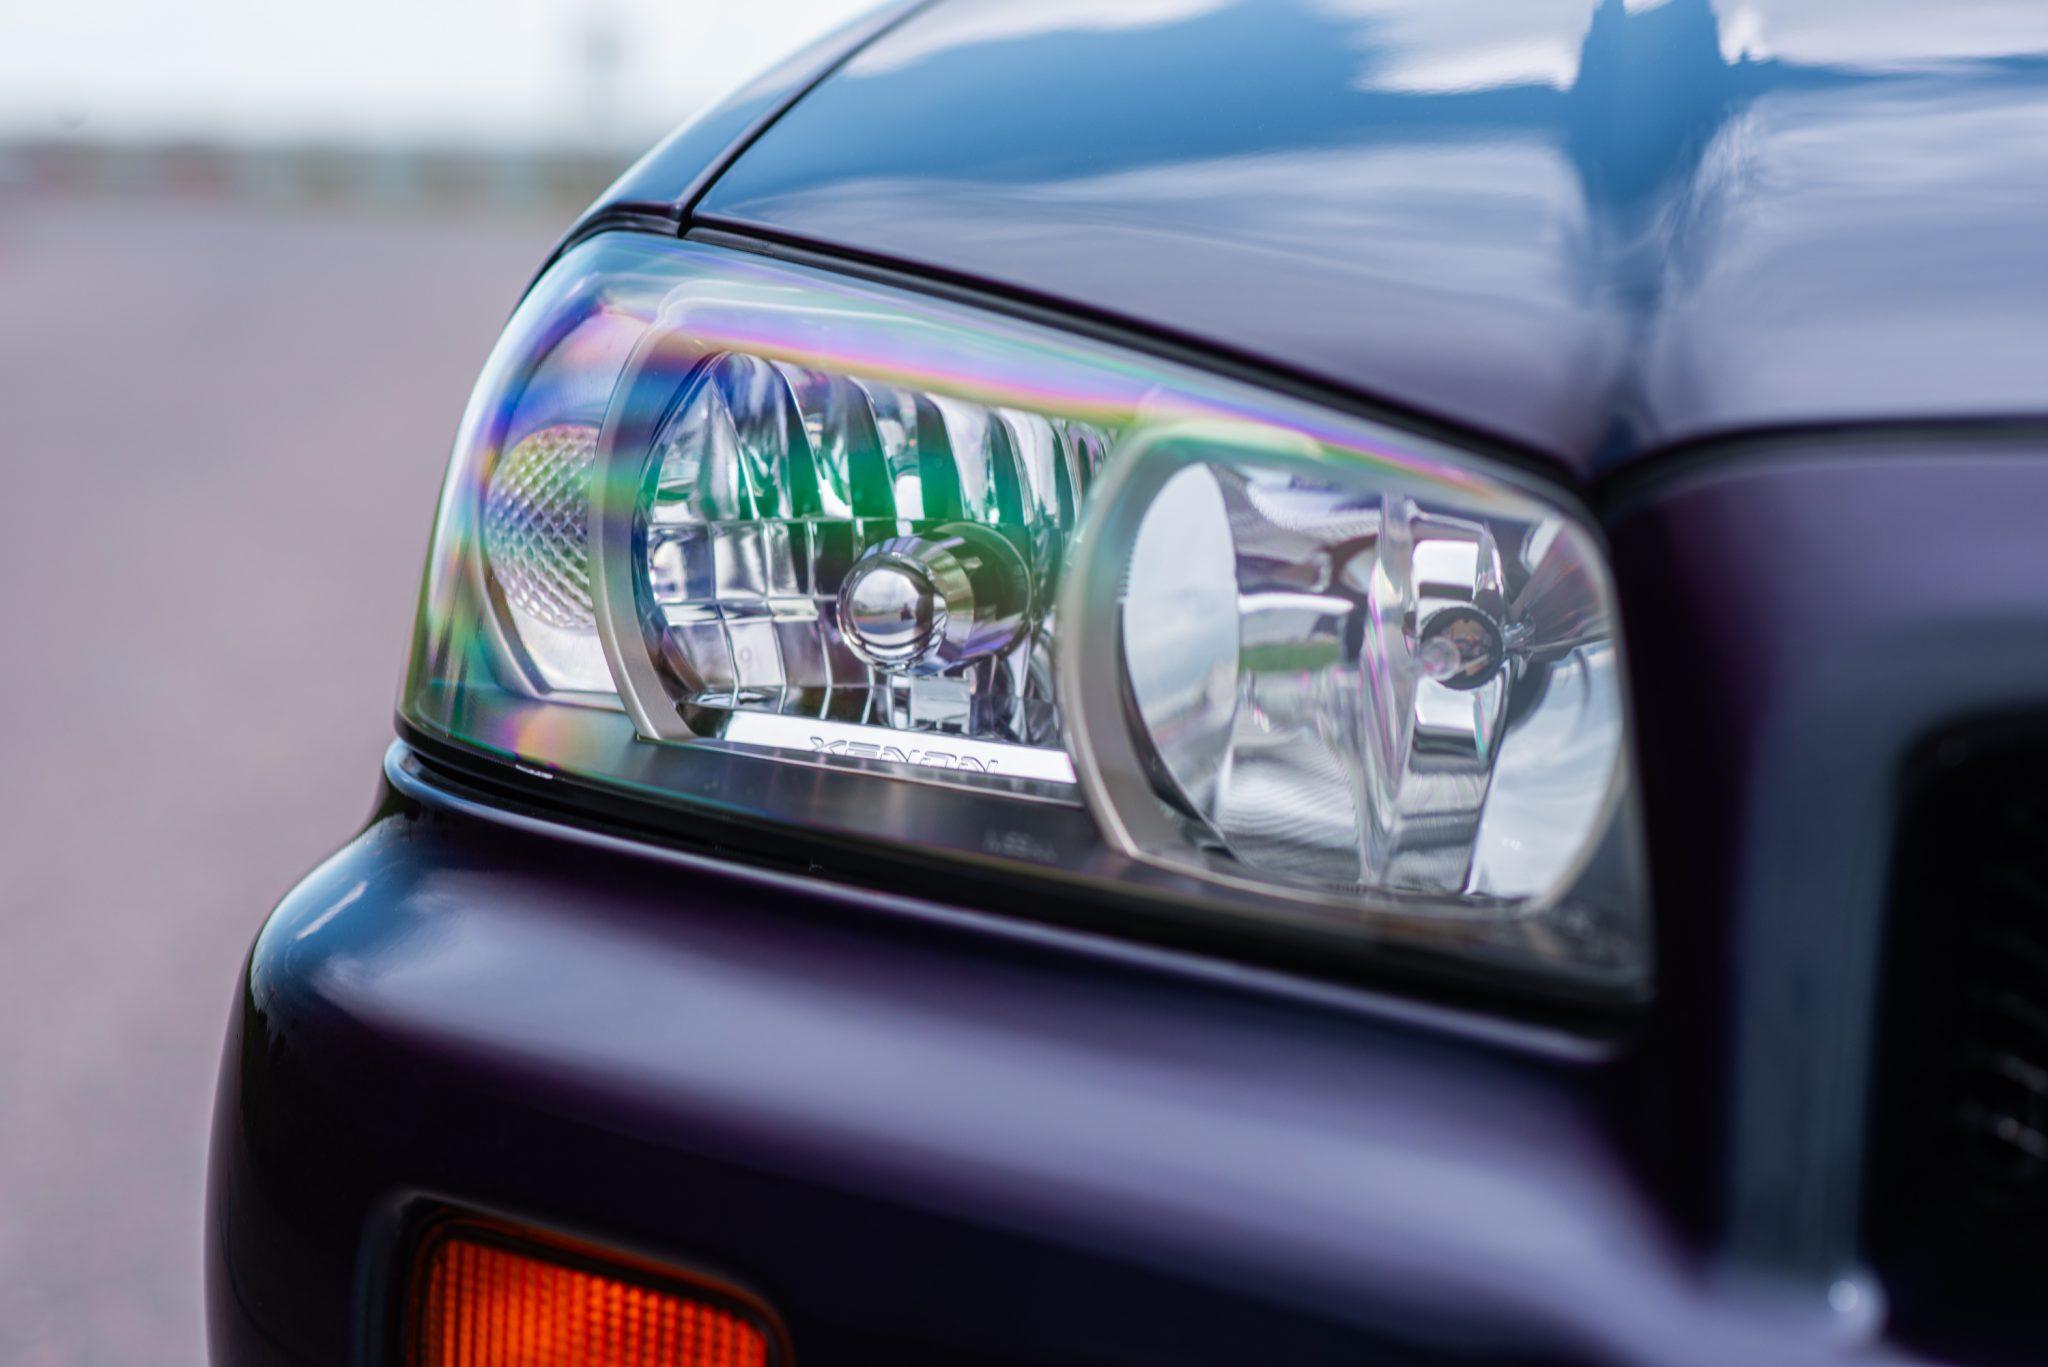 1999 Nissan Skyline GT-R V-Spec headlight detail